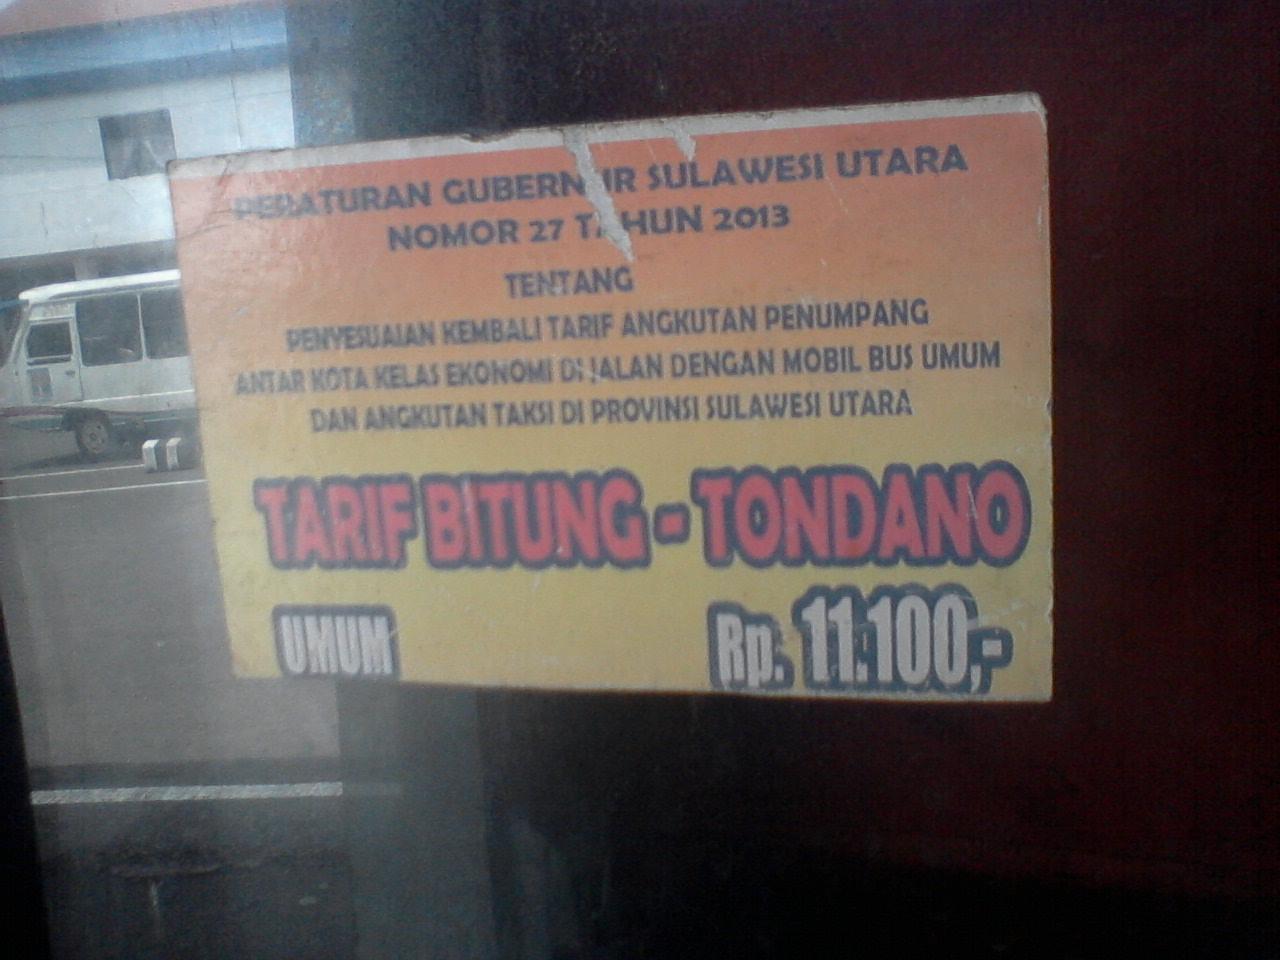 Stiker Tarif di Kaca Pintu Otobus